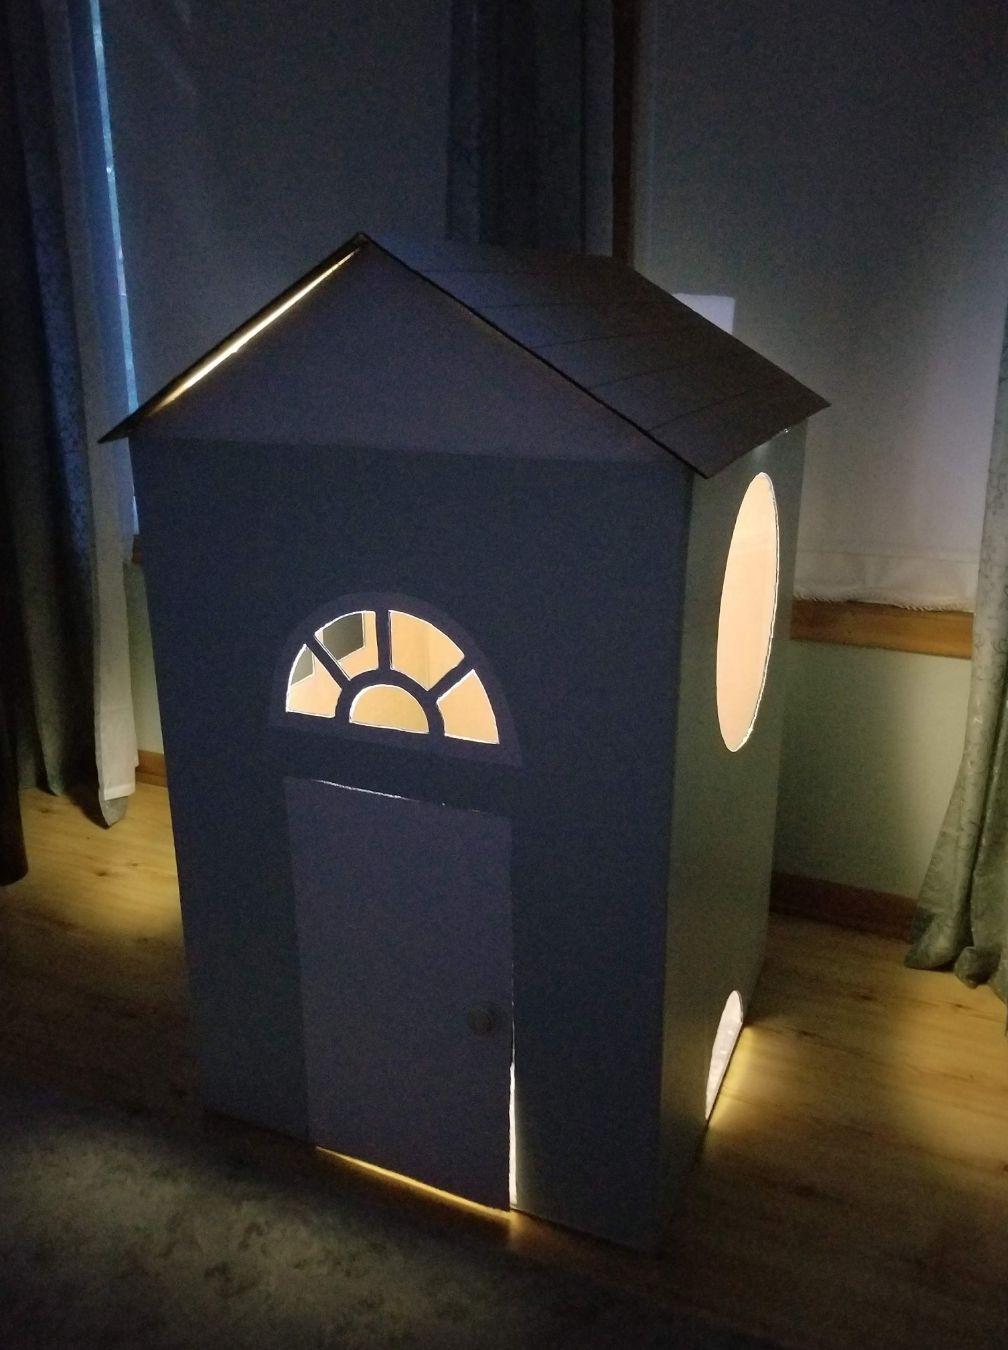 Kids like cardboard playhouses